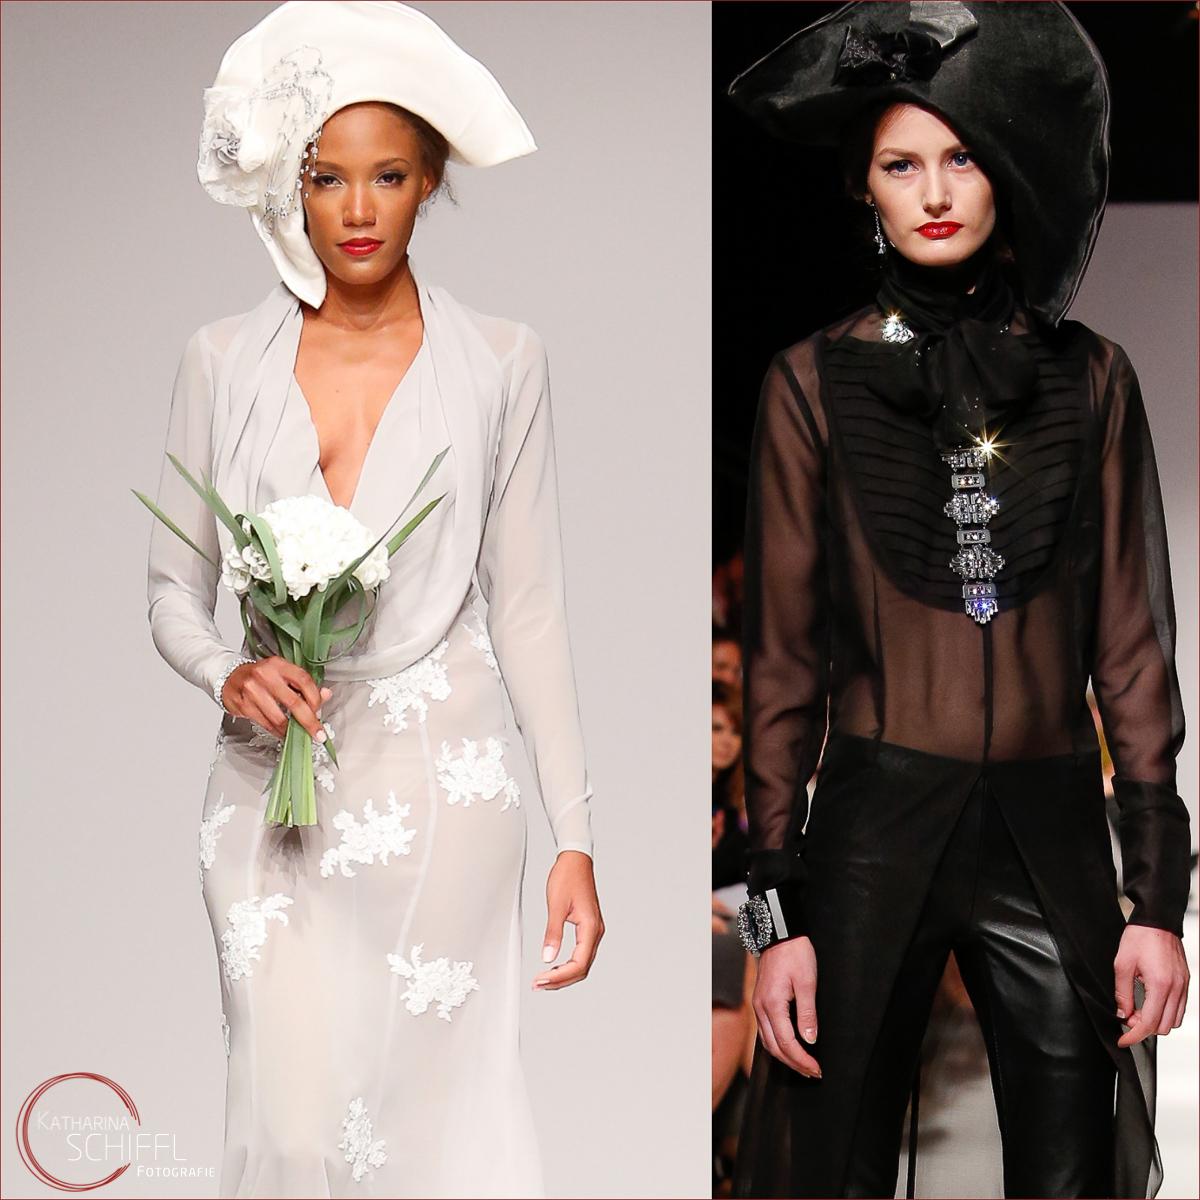 MQ Vienna Fashion Week – TIBERIUS